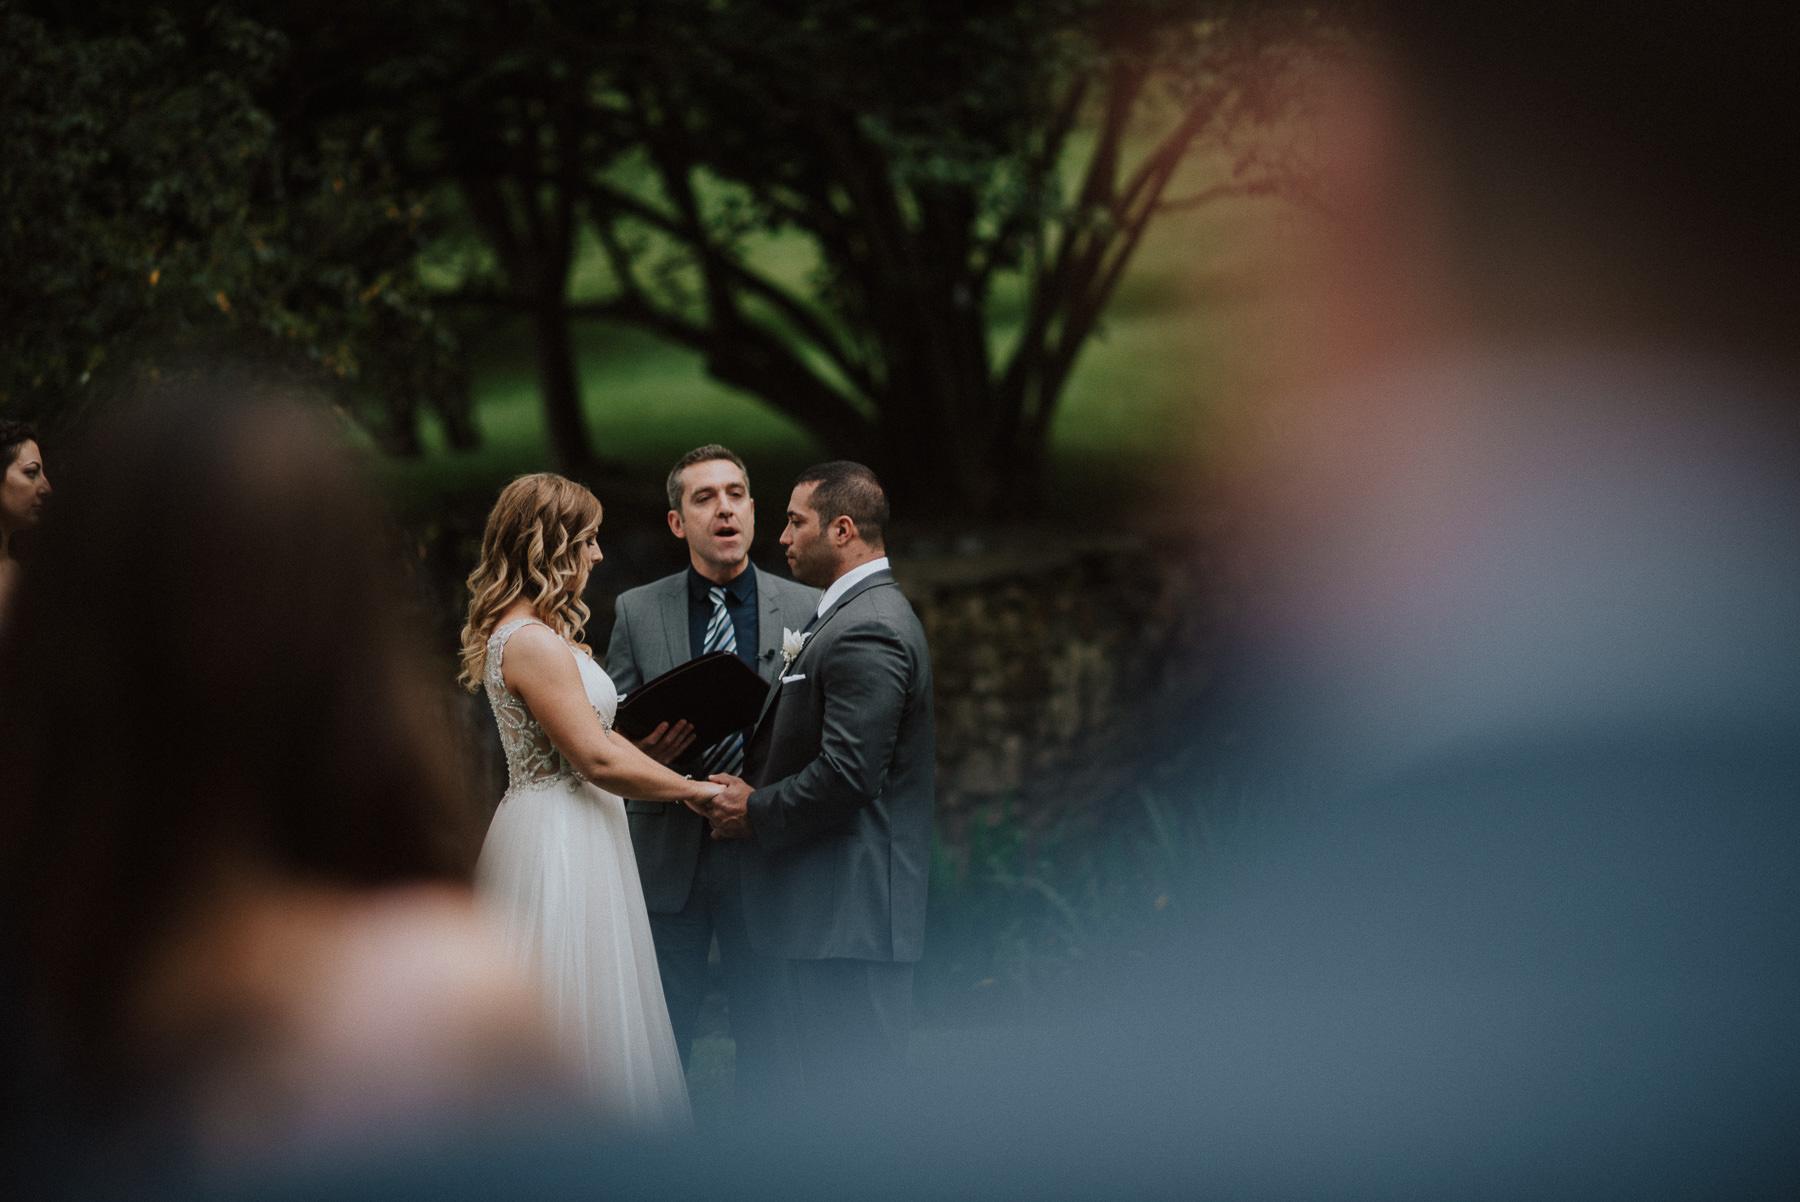 appleford-estate-wedding-photography-58.jpg